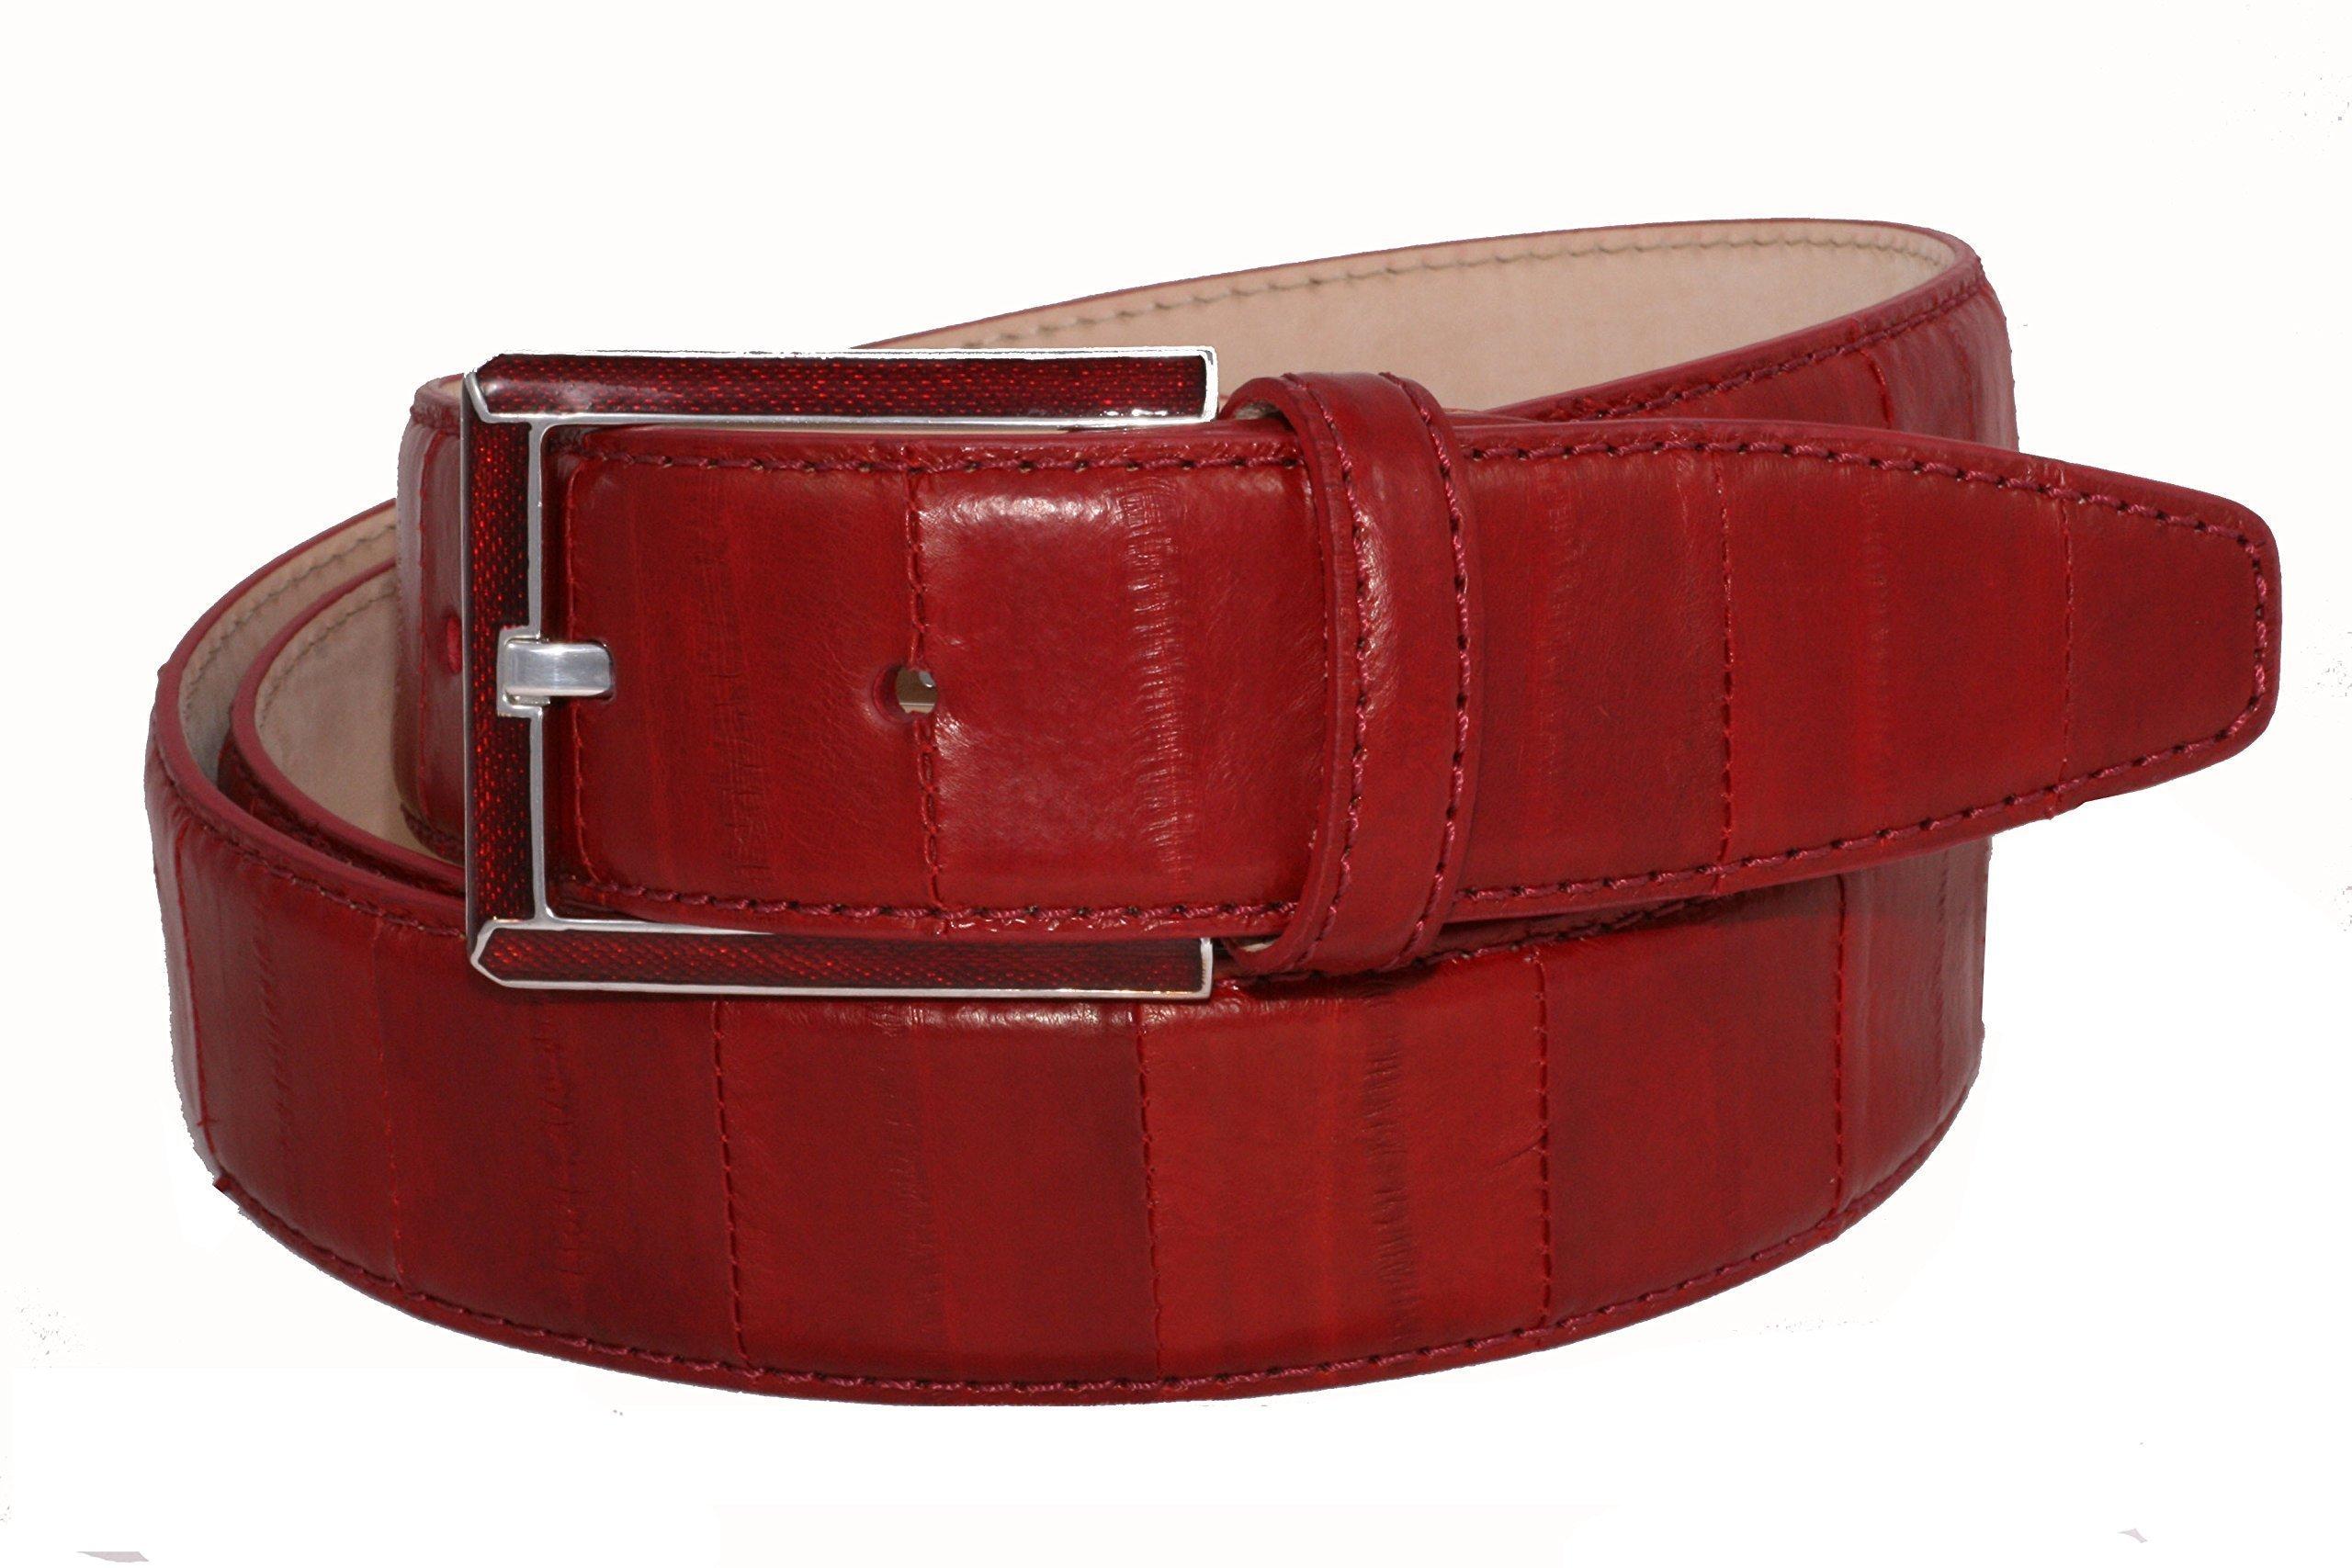 Urso Belt buckle in Sterling silver and Eel Skin